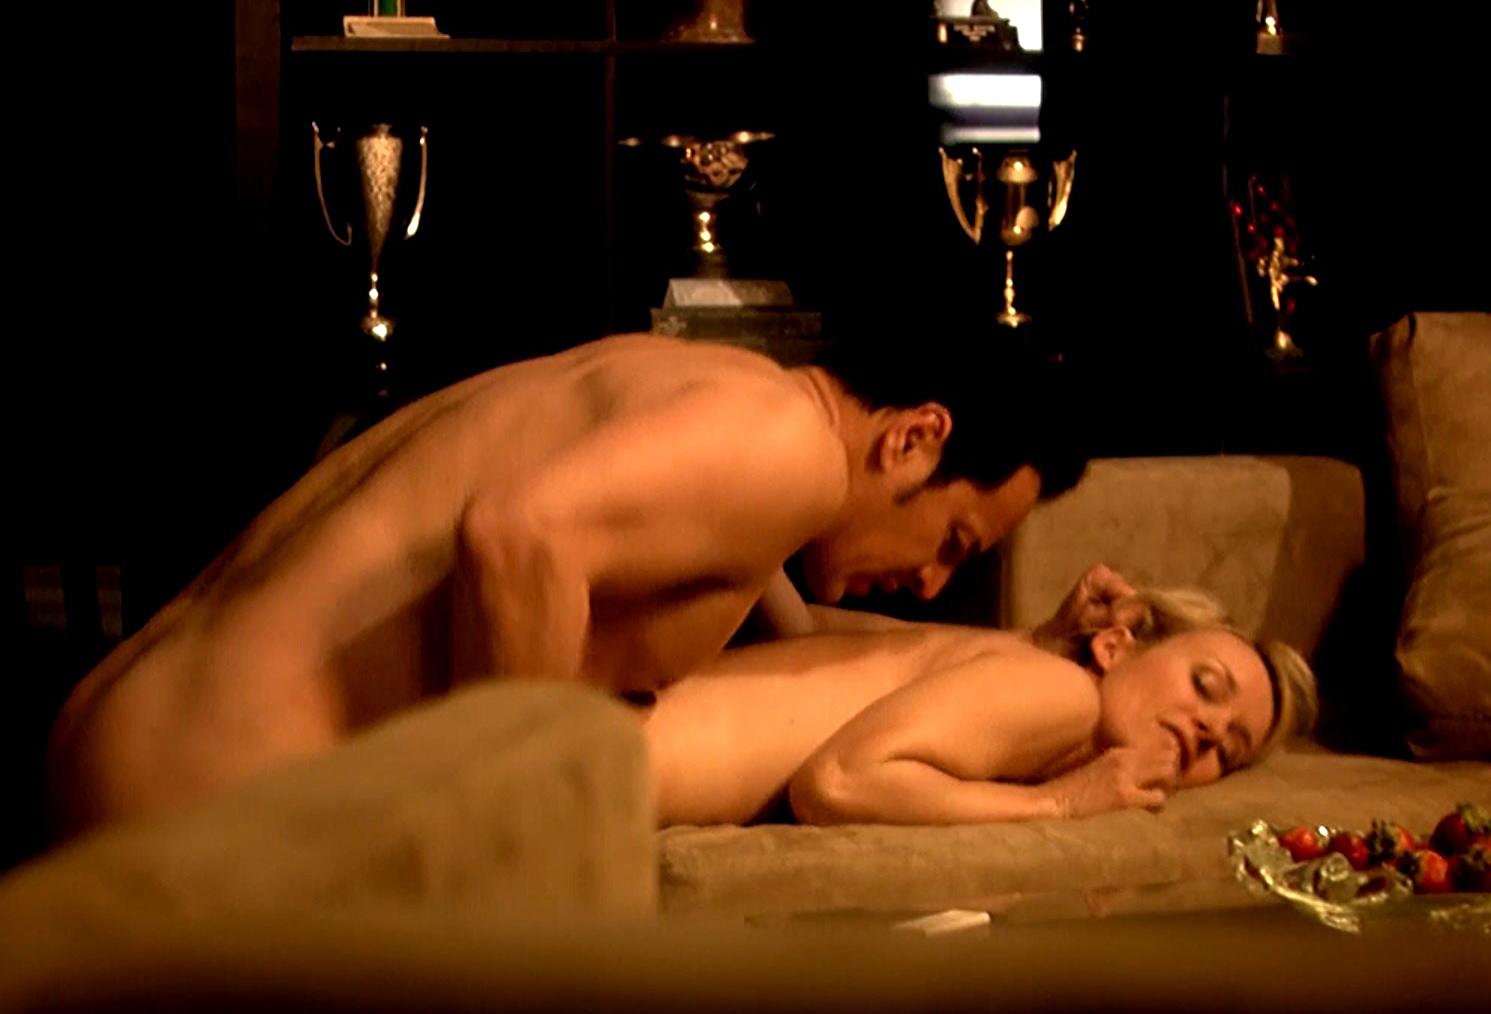 Rachel McCord Naked nudes (21 photo), Pussy Celebrity image